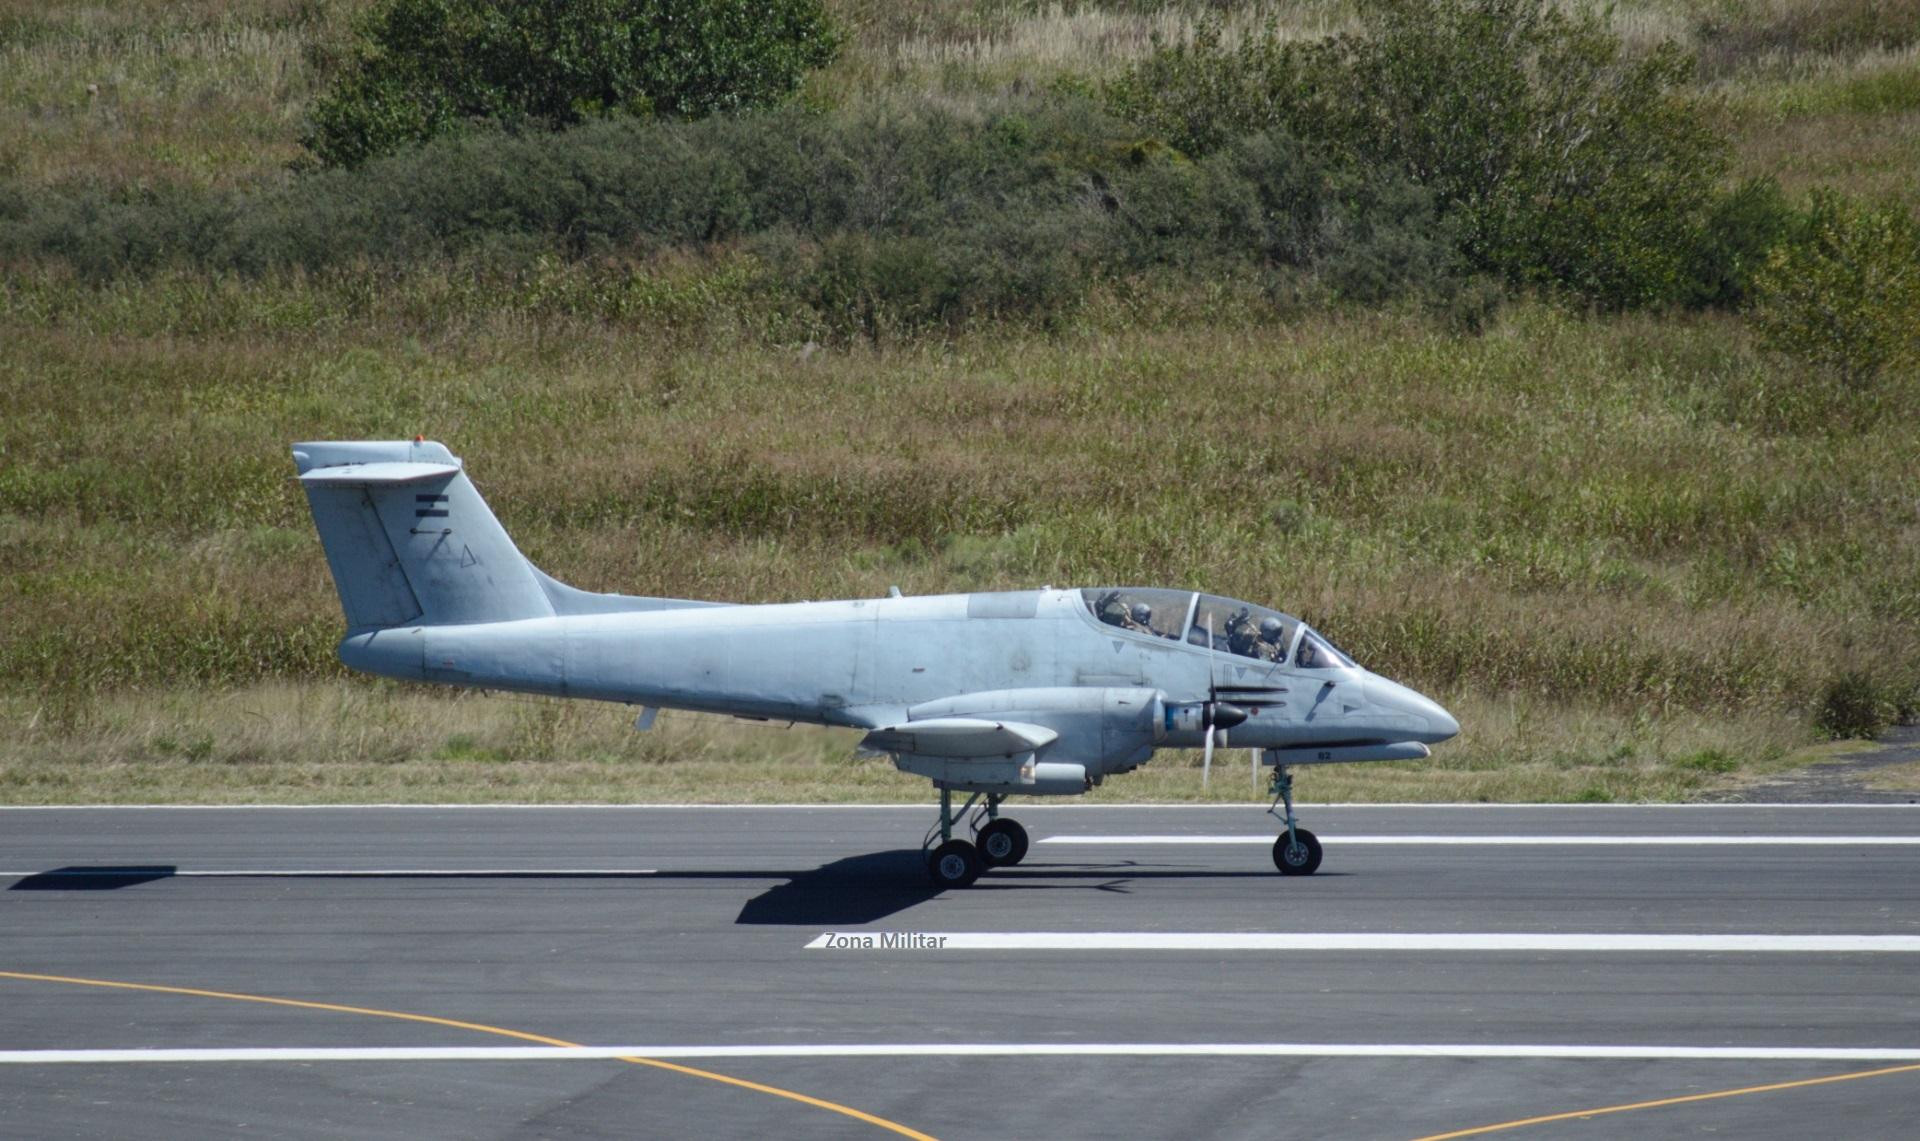 Argentina - Página 8 IA-58-Pucara-EAM-5